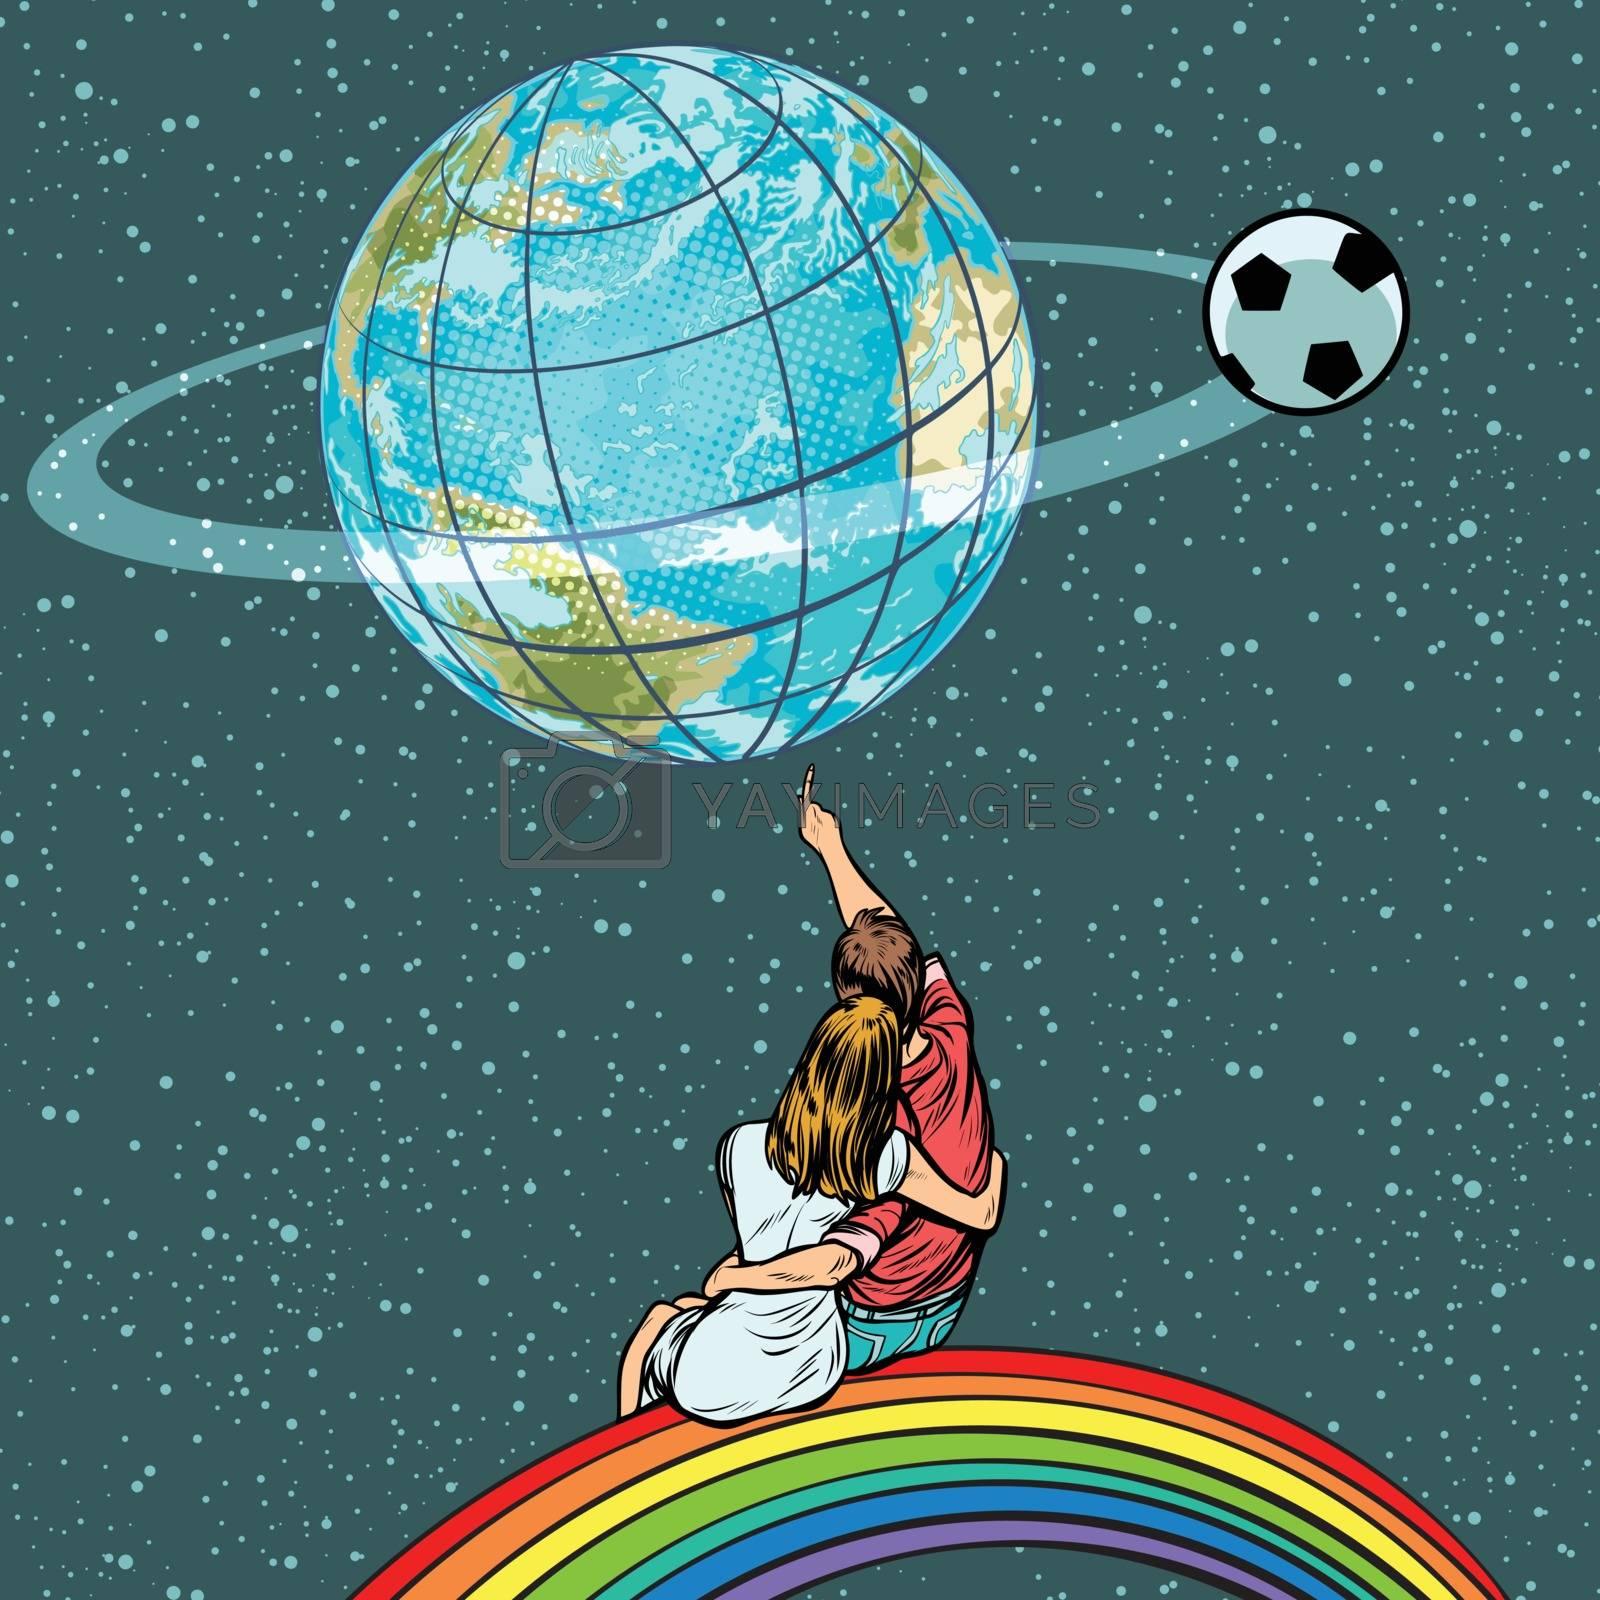 fans watch the football championship. Pop art retro vector illustration kitsch vintage